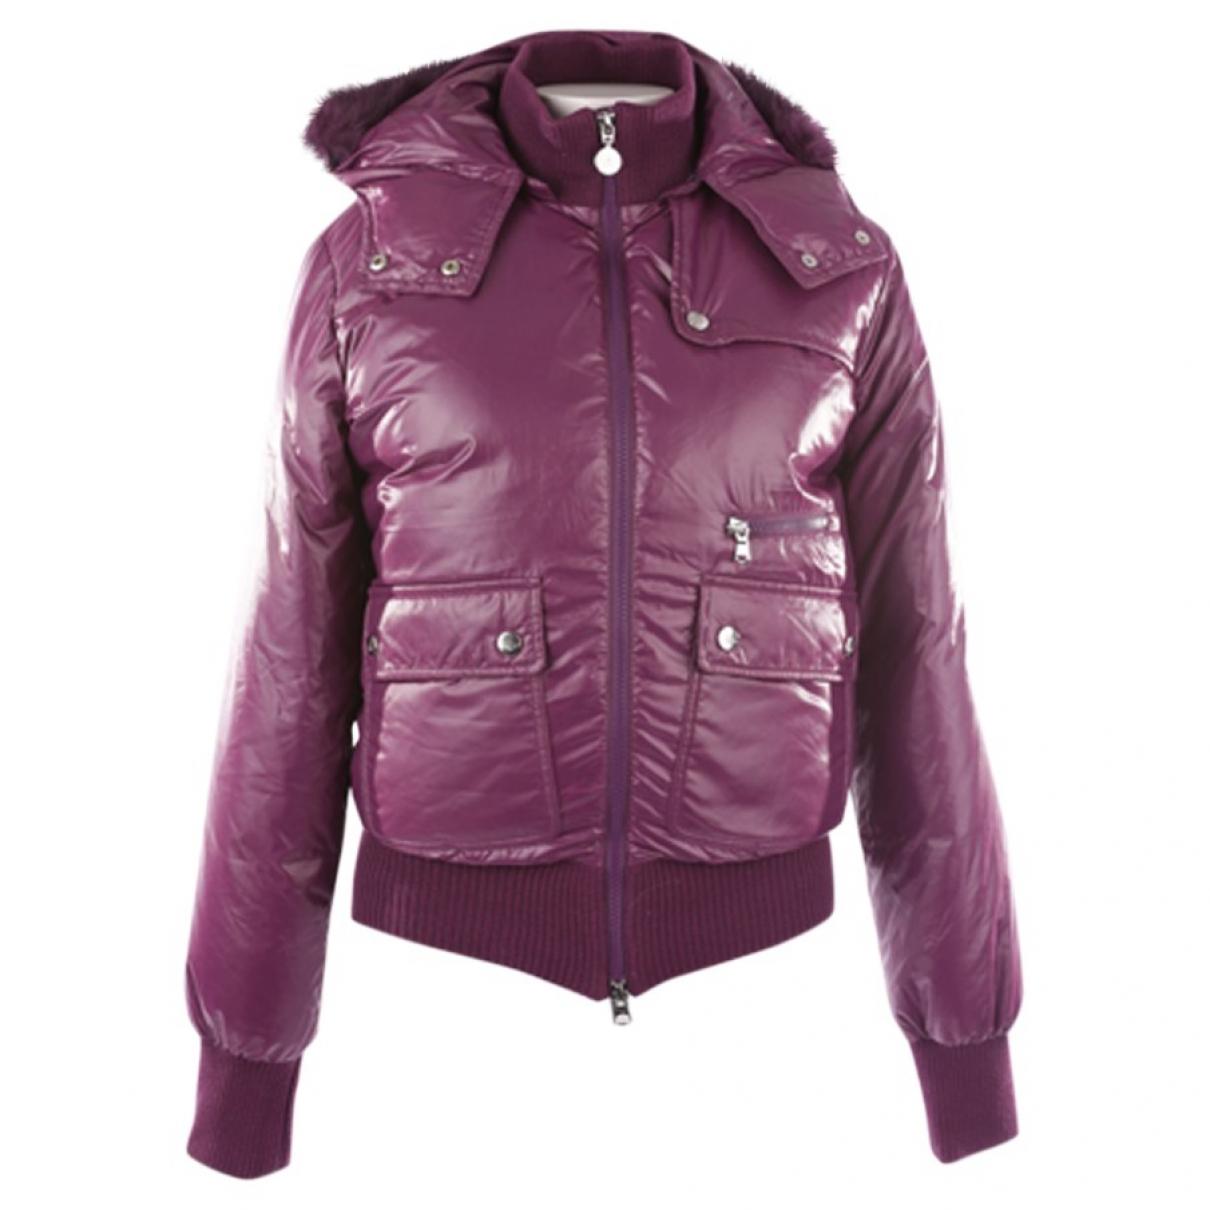 Emporio Armani \N Purple jacket for Women 38 FR